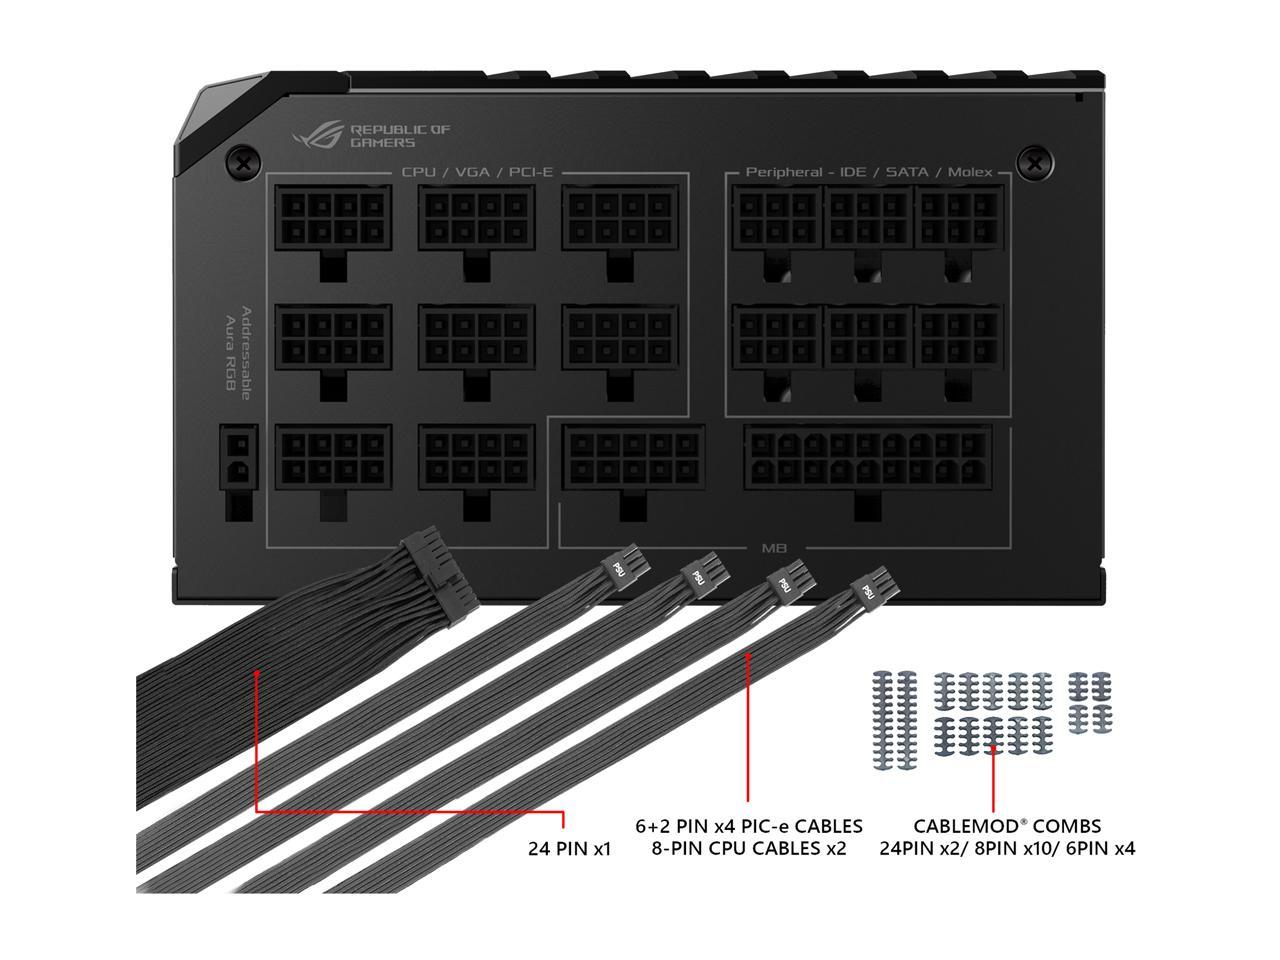 ASUS ROG Thor 1200 80 Platinum 1200W Fully Modular RGB Power Supply with LIVEDA